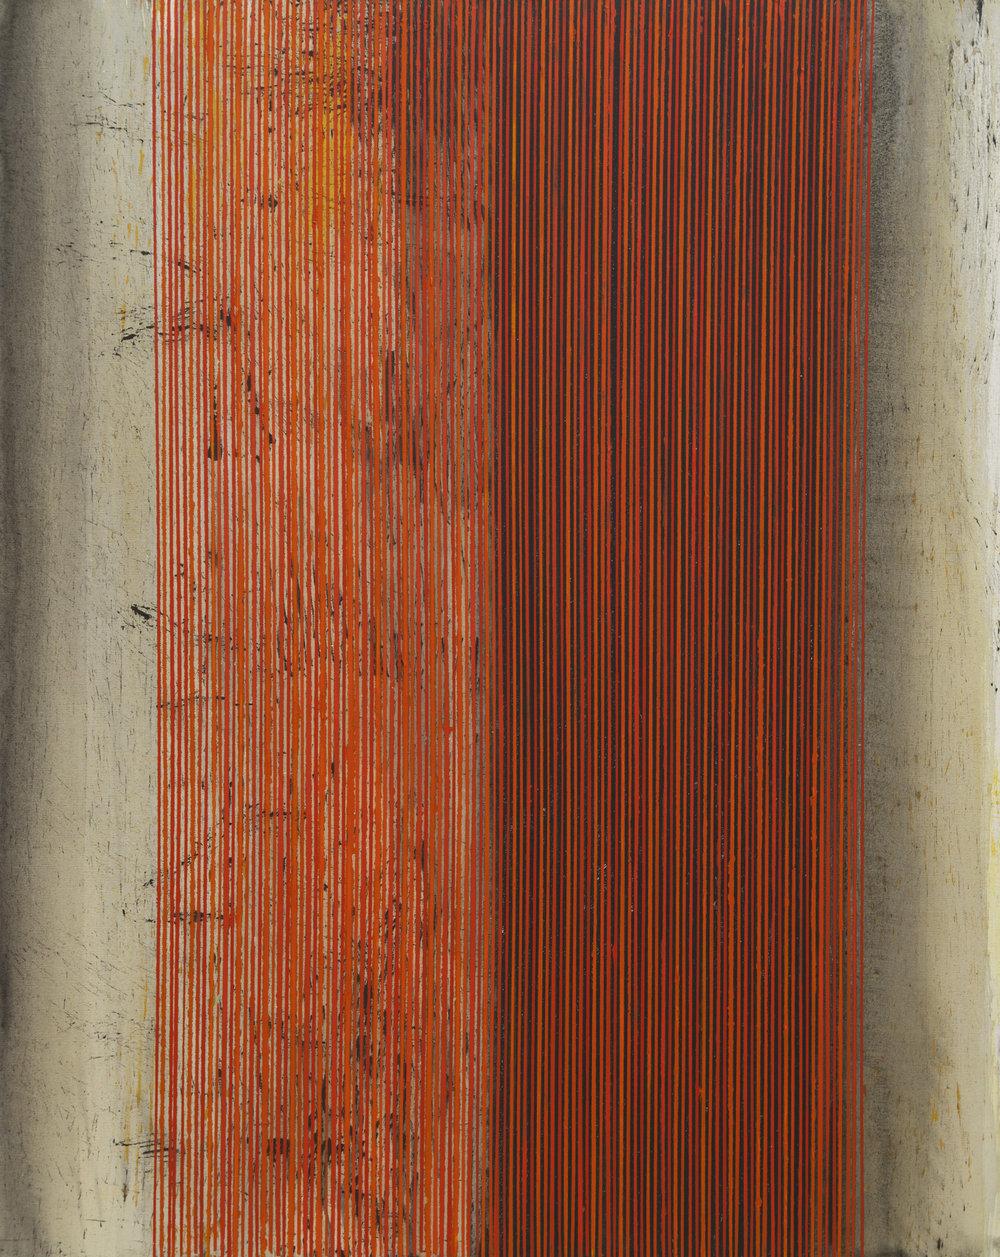 5 Herbert Egger –TRANSIT II-2017-80 x 100 cm-acrylic on canvas.jpg